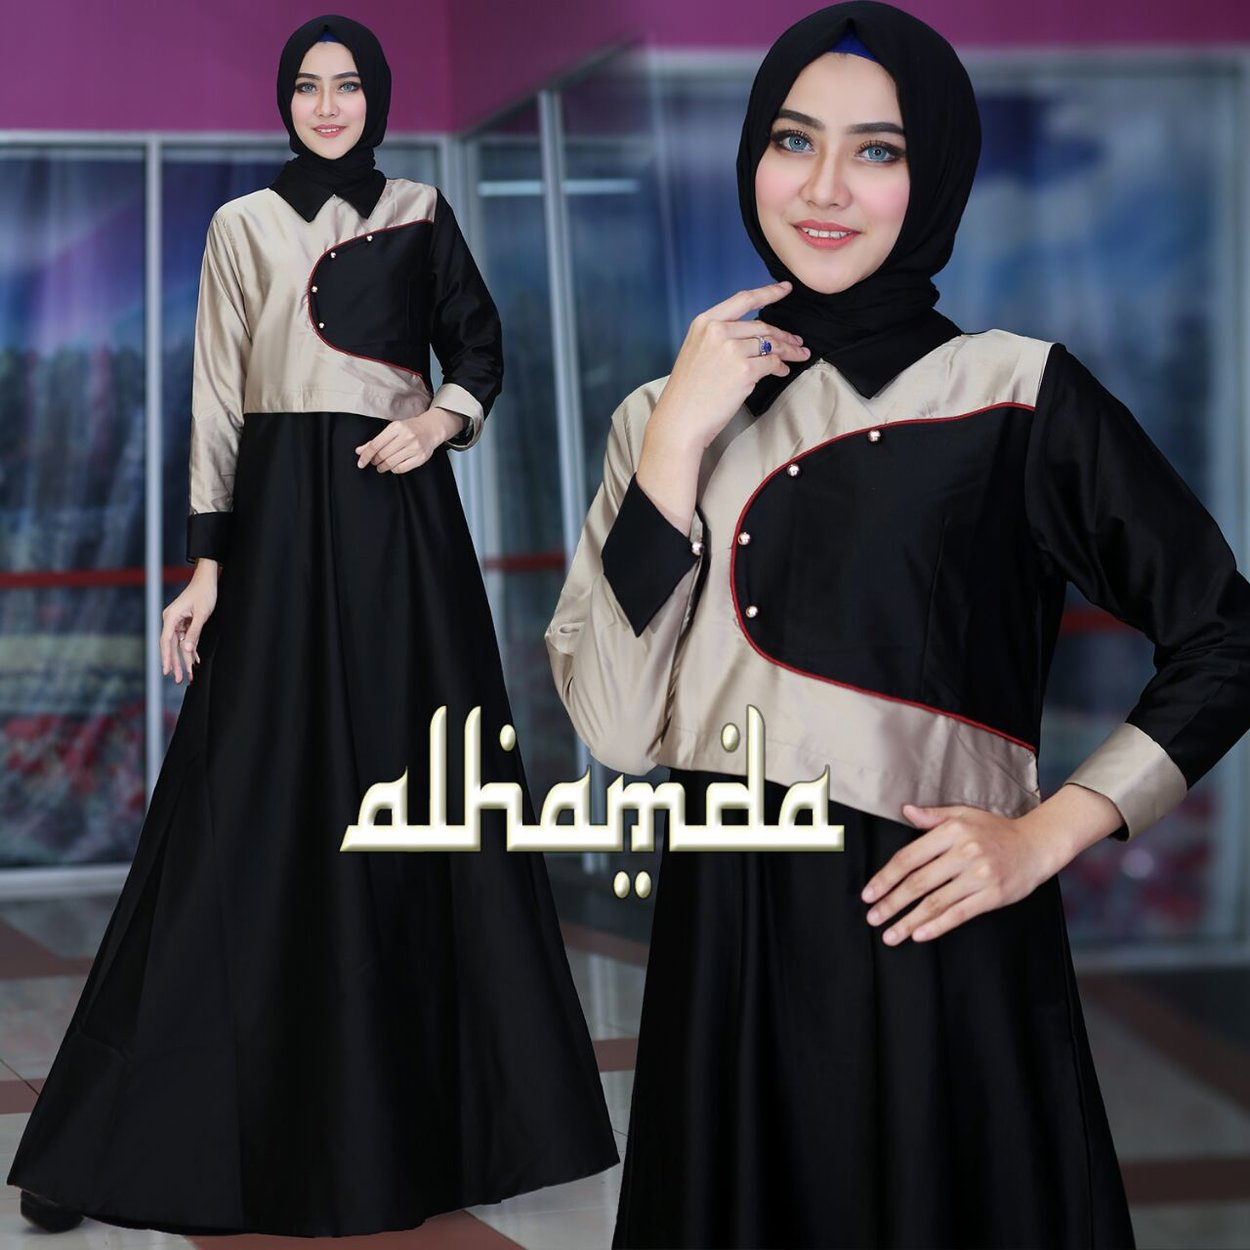 Alhamda hitam